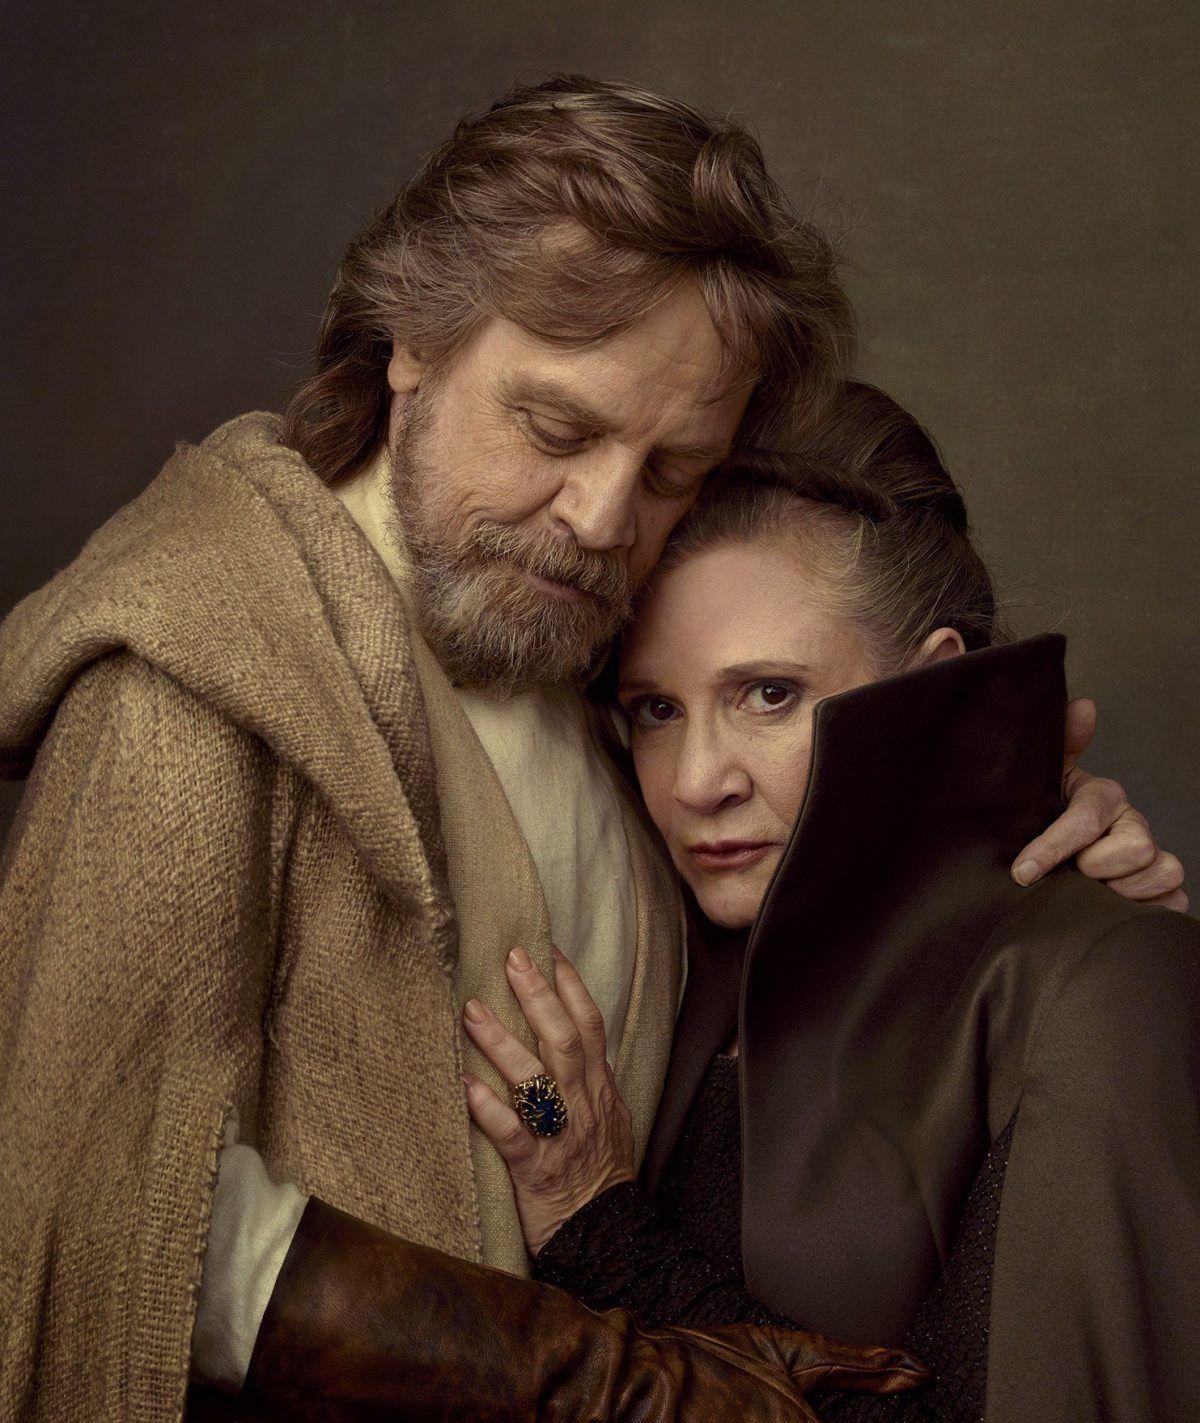 0bbbcccf181ad7432eb9dac3e27af4a3 20 Reasons Why Star Wars: The Last Jedi Is The Best Film In The Saga So Far